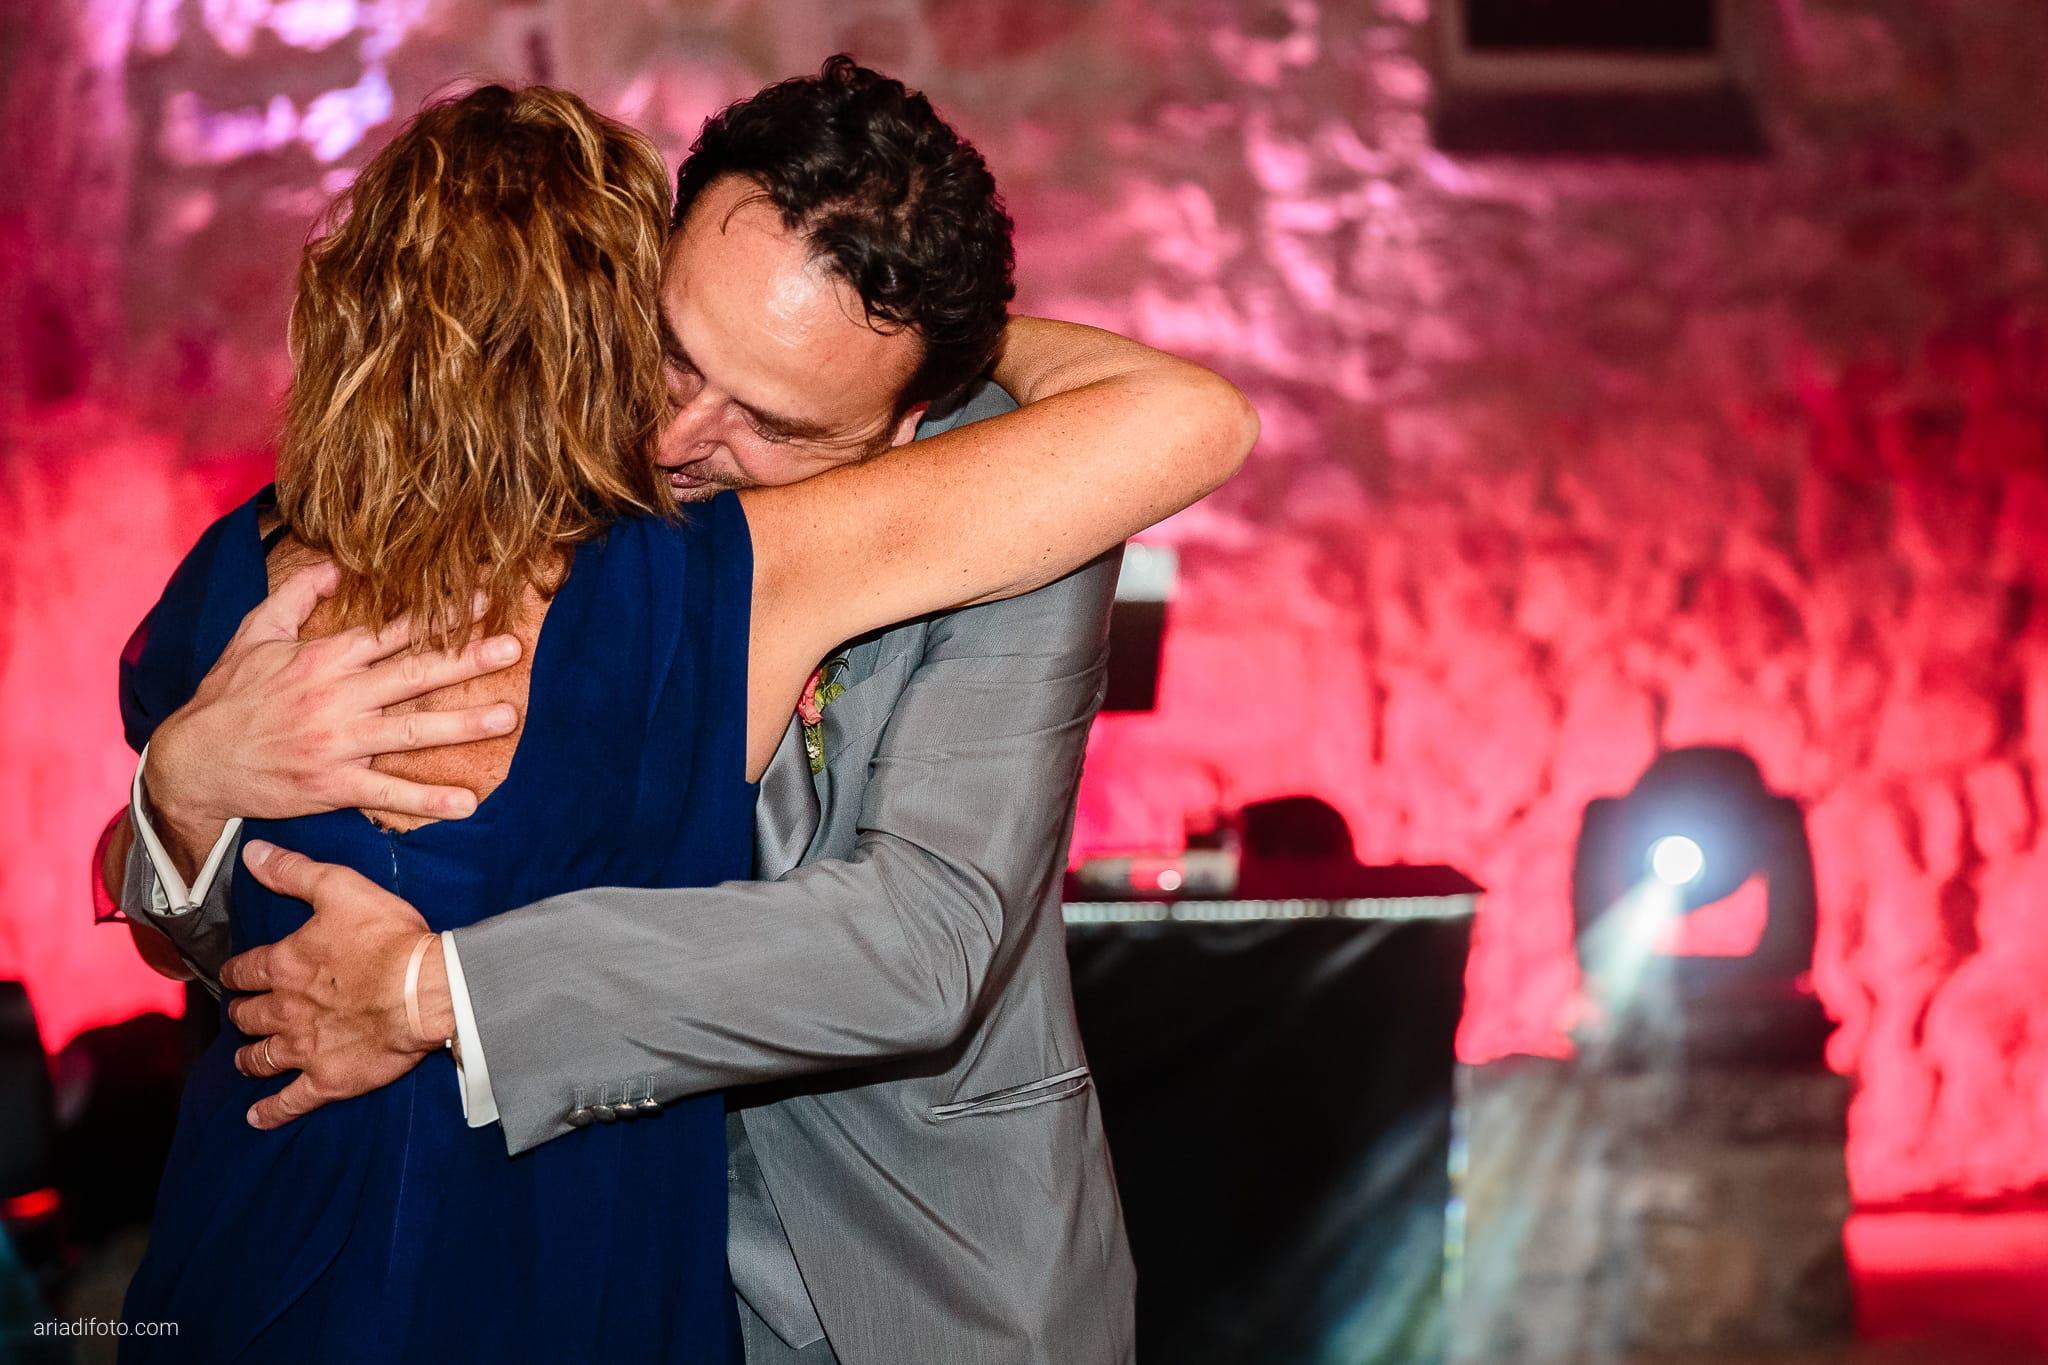 Valentina Francesco Matrimonio Pagnacco Castello Villalta Fagagna Udine ricevimento festa primo ballo mamma